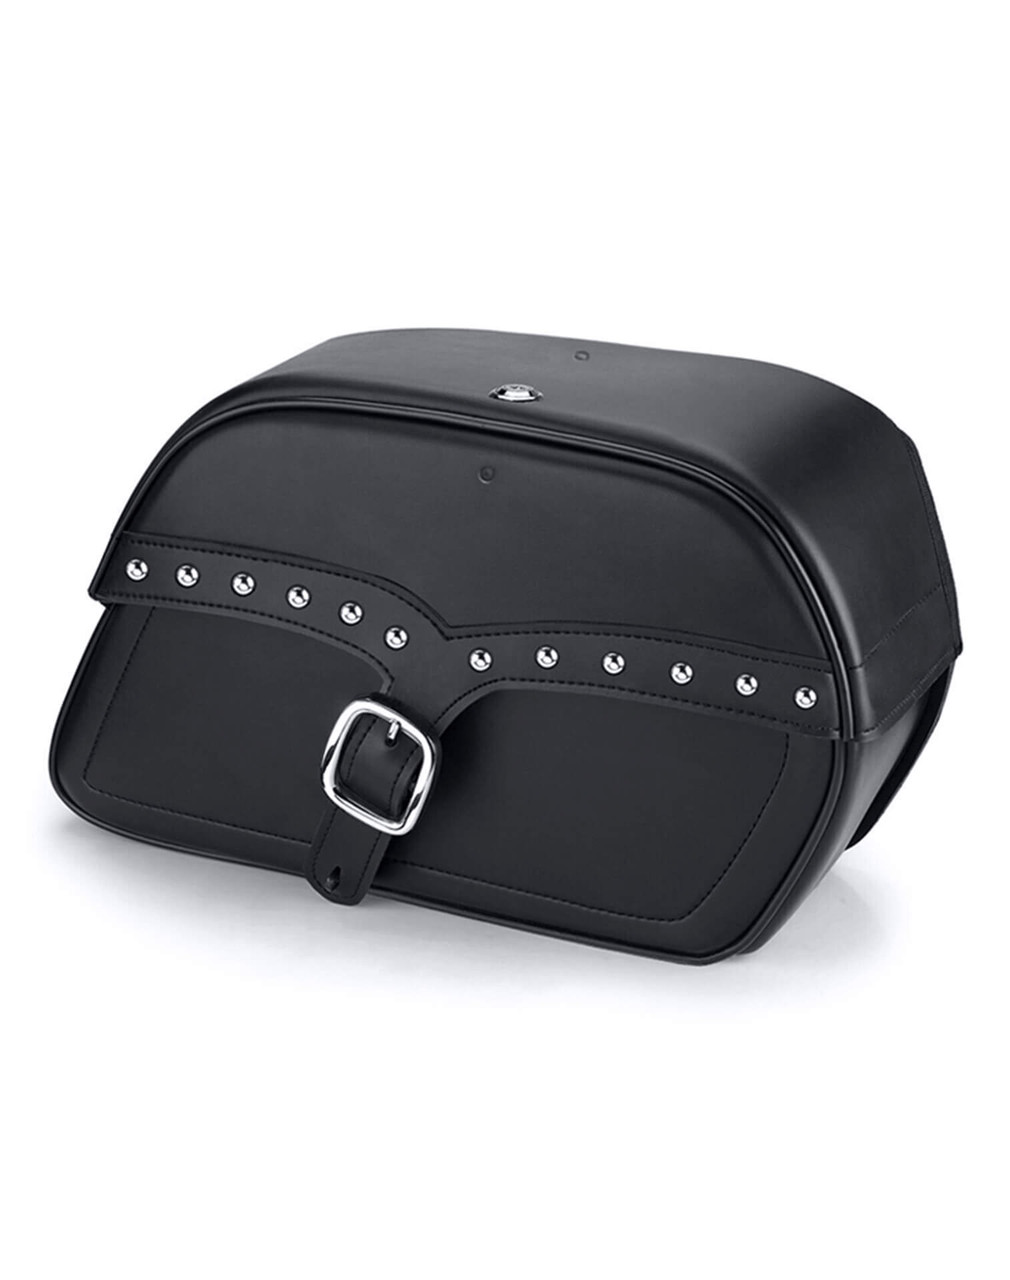 Yamaha Startoliner XV 1900 Large Charger Single Strap Studded Motorcycle Saddlebags Main Bag View